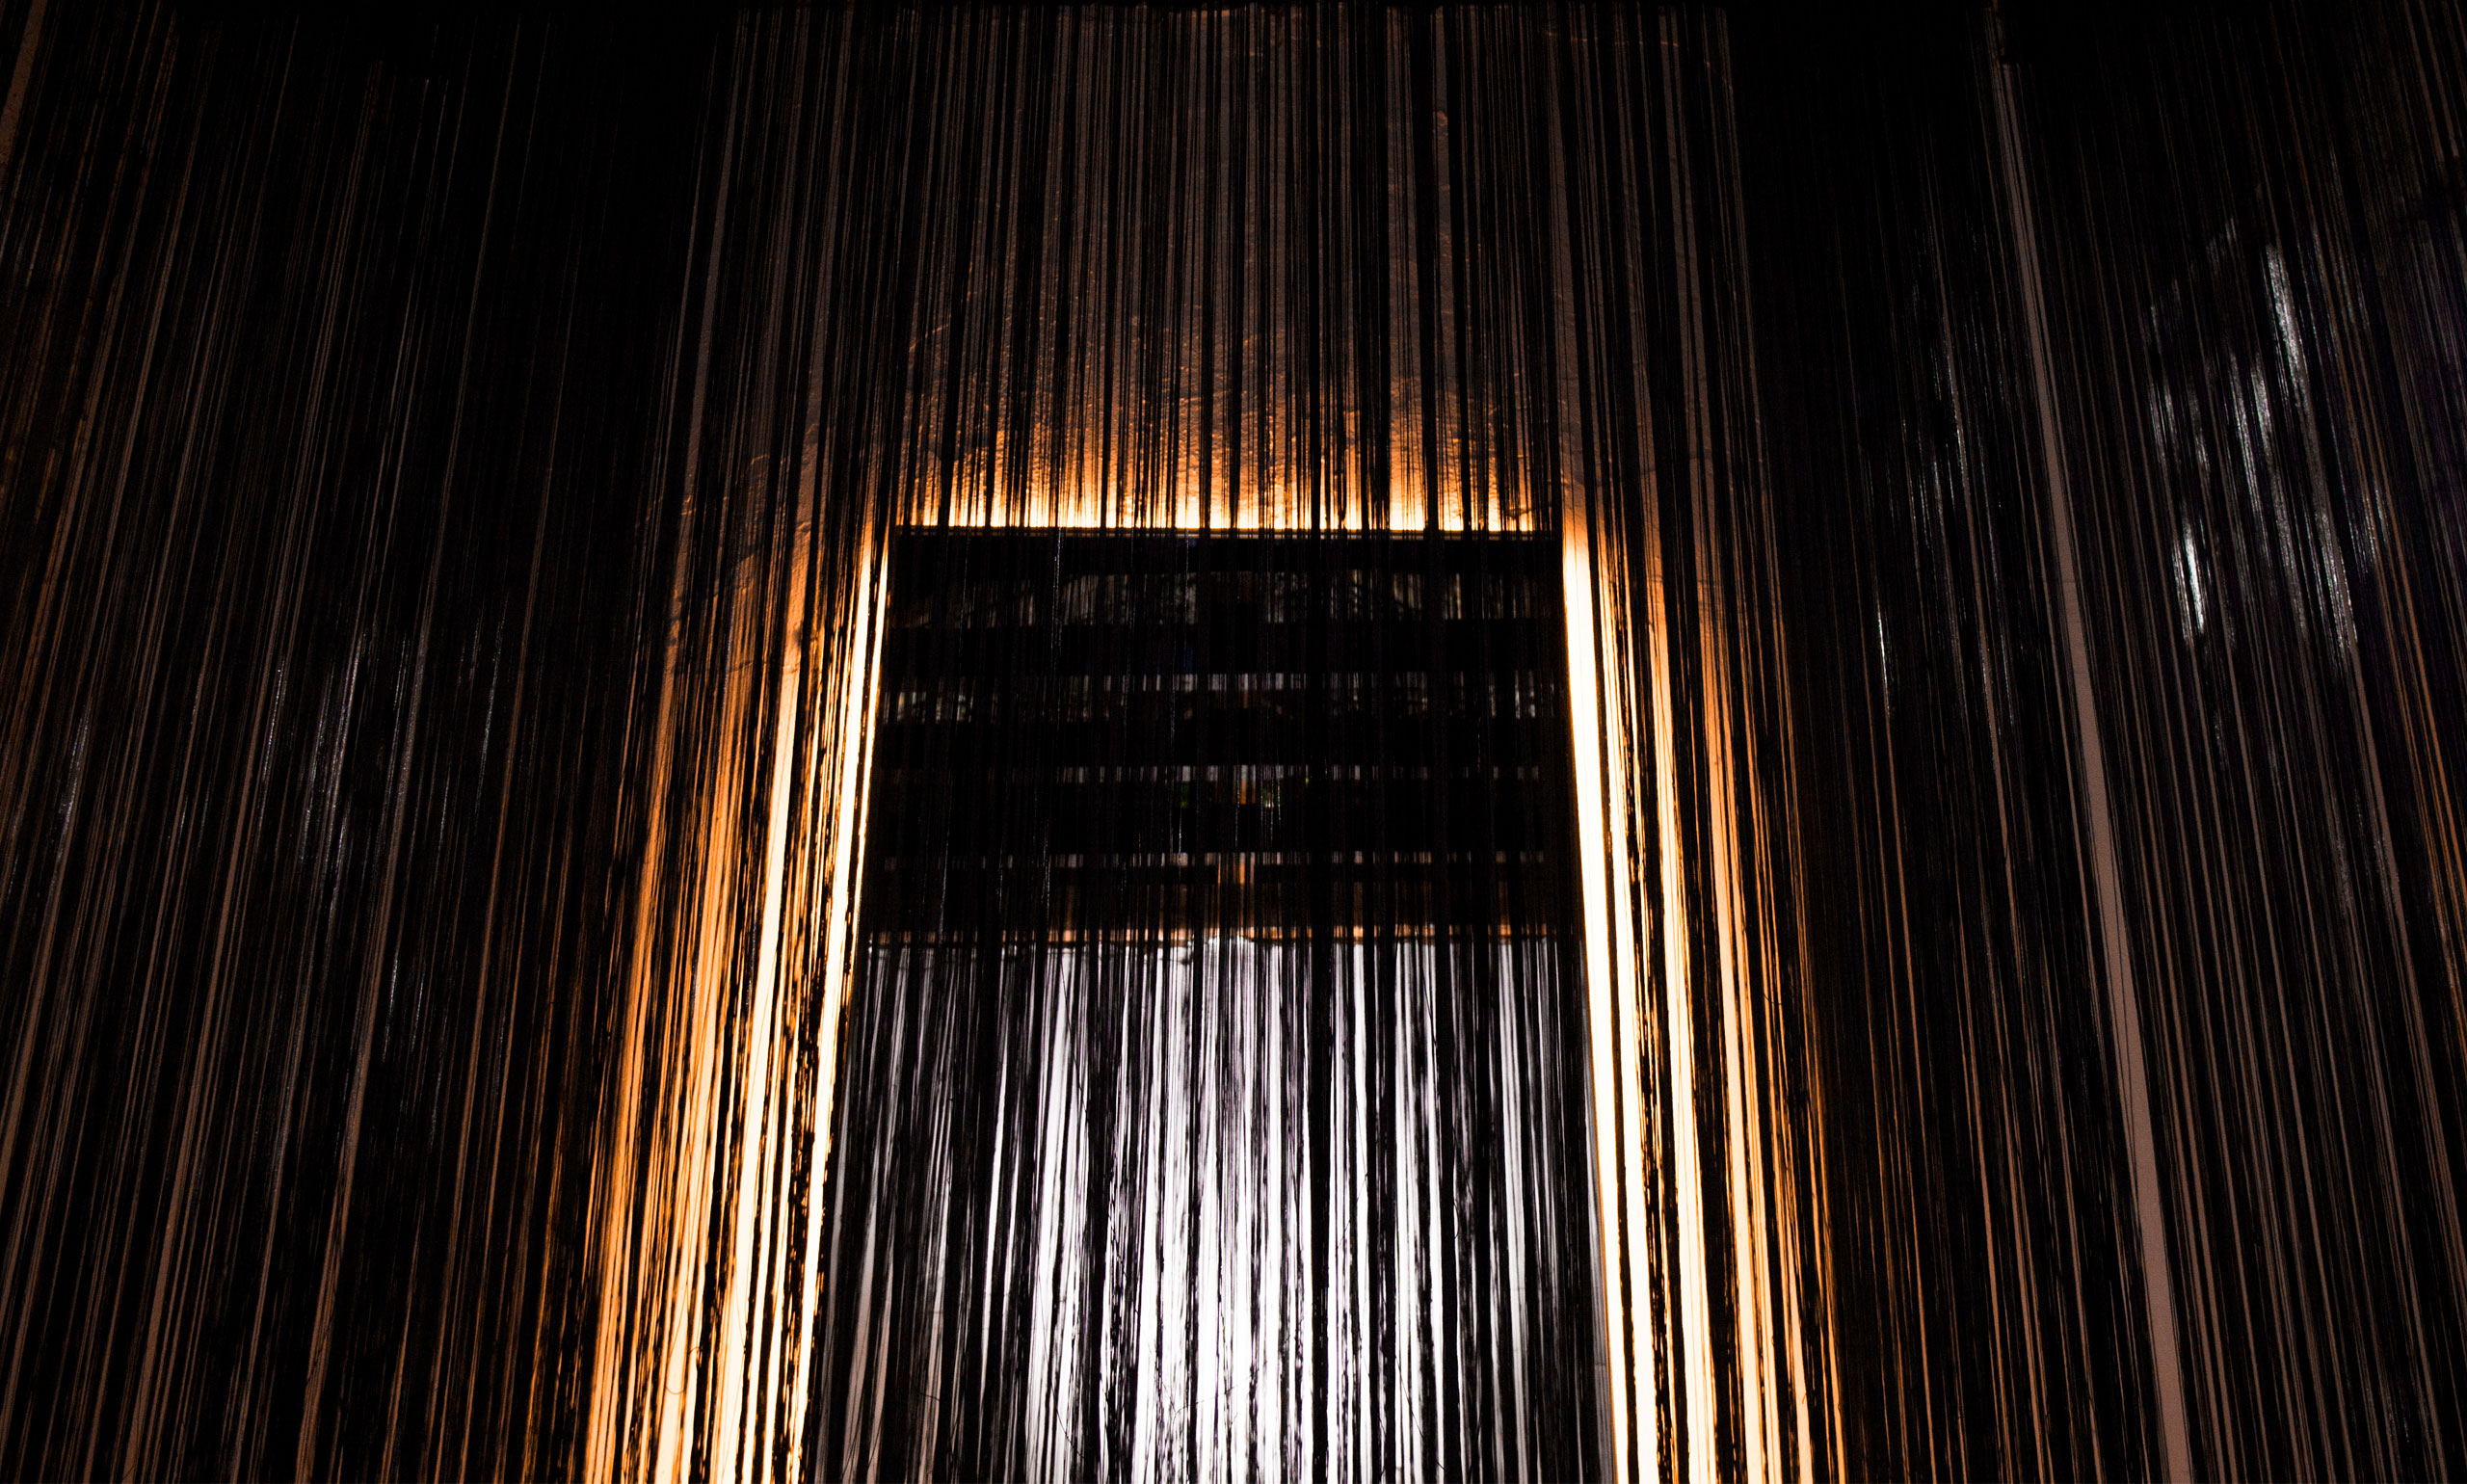 diseno_exposicion_efimera_espacio_strand_light_espejo_negro_retroiluminacion_cortina_hilos_frontal